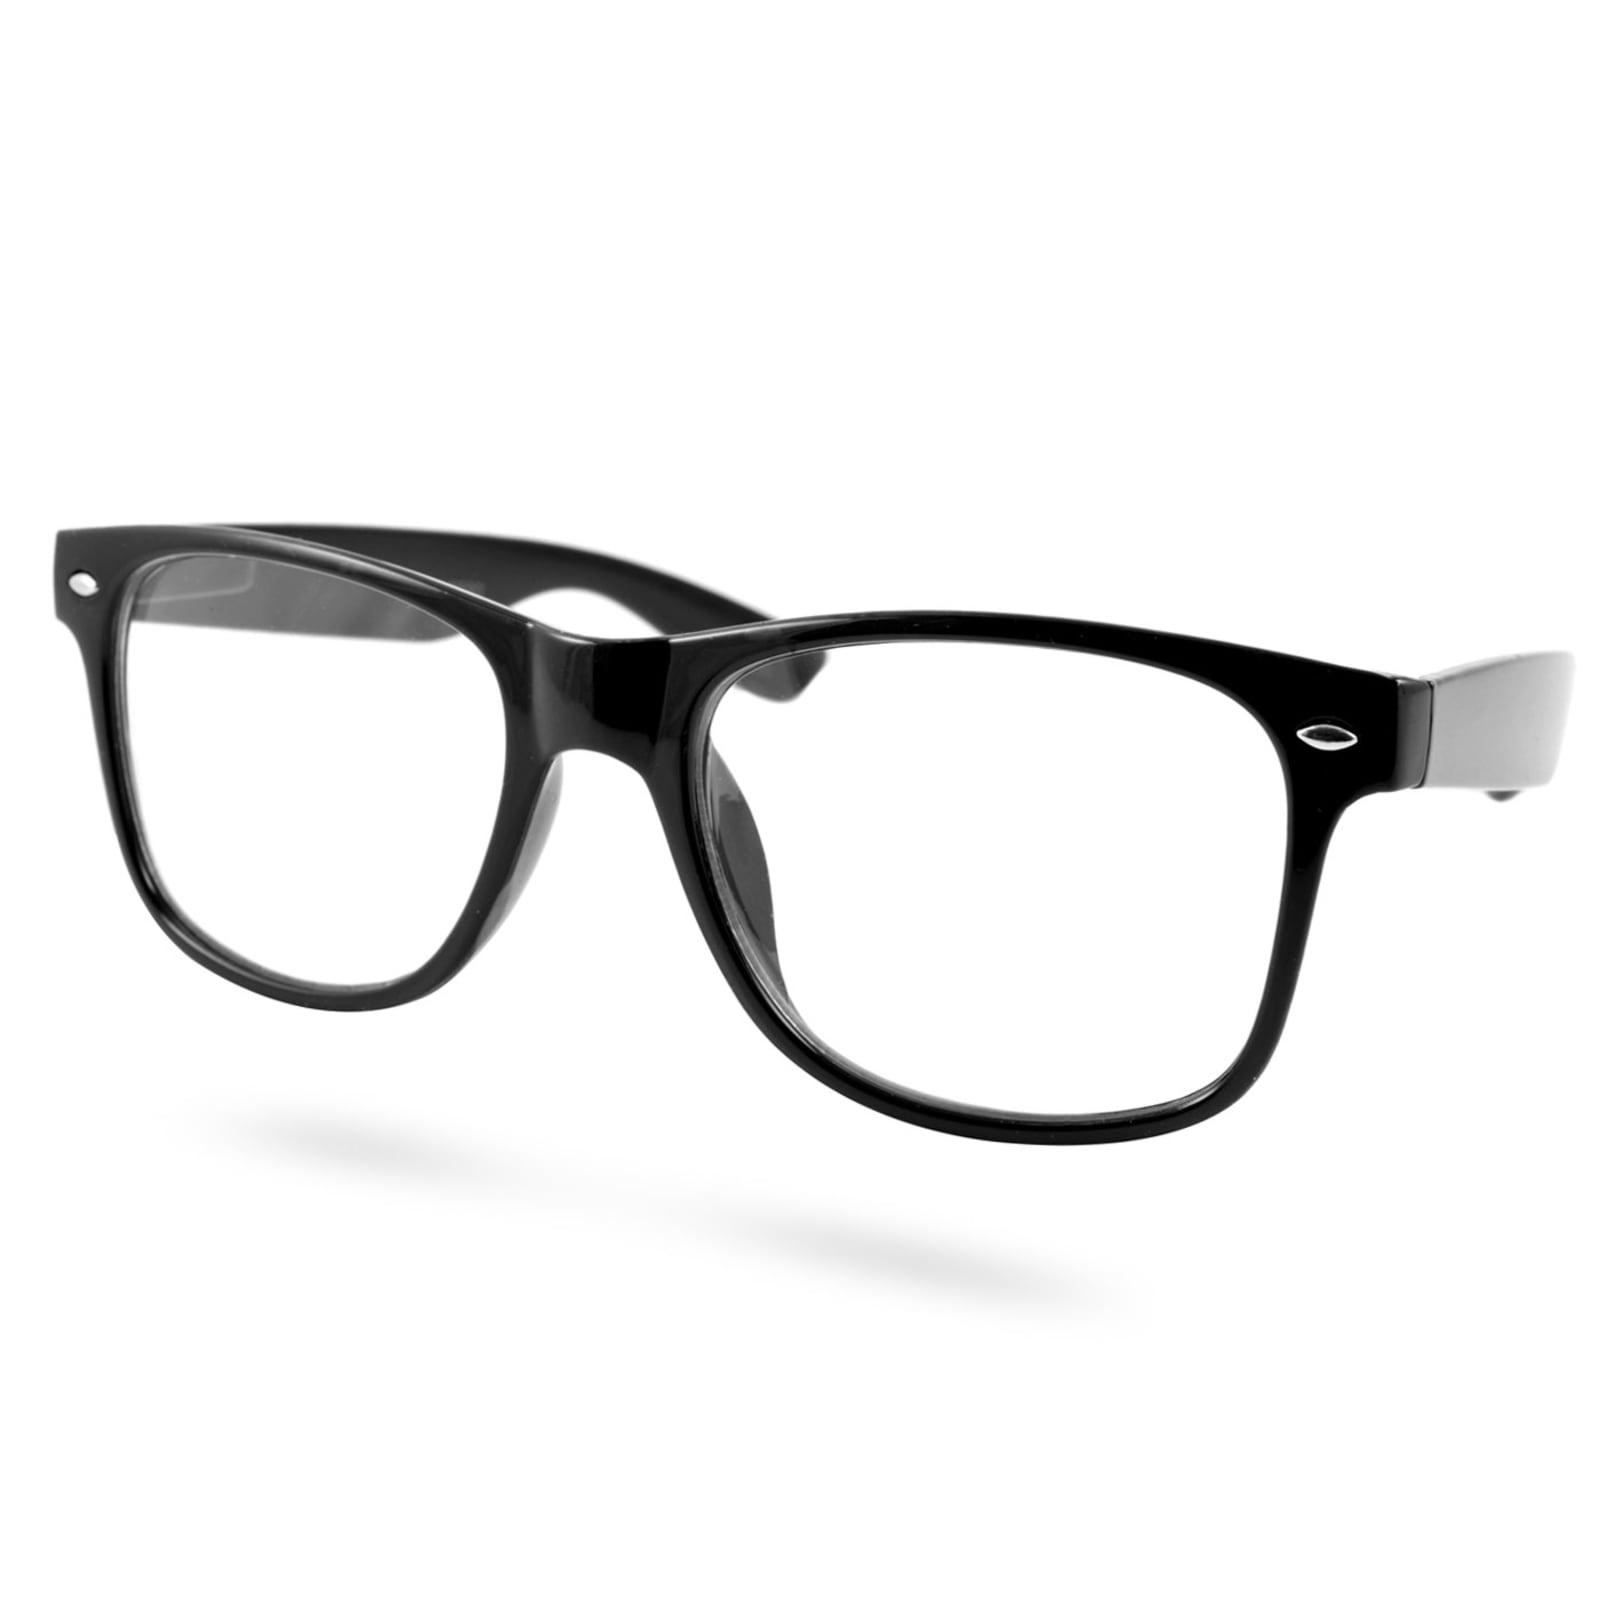 c6759ed0c EverShade Malé čierne retro okuliare s čírymi šošovkami - Glami.sk